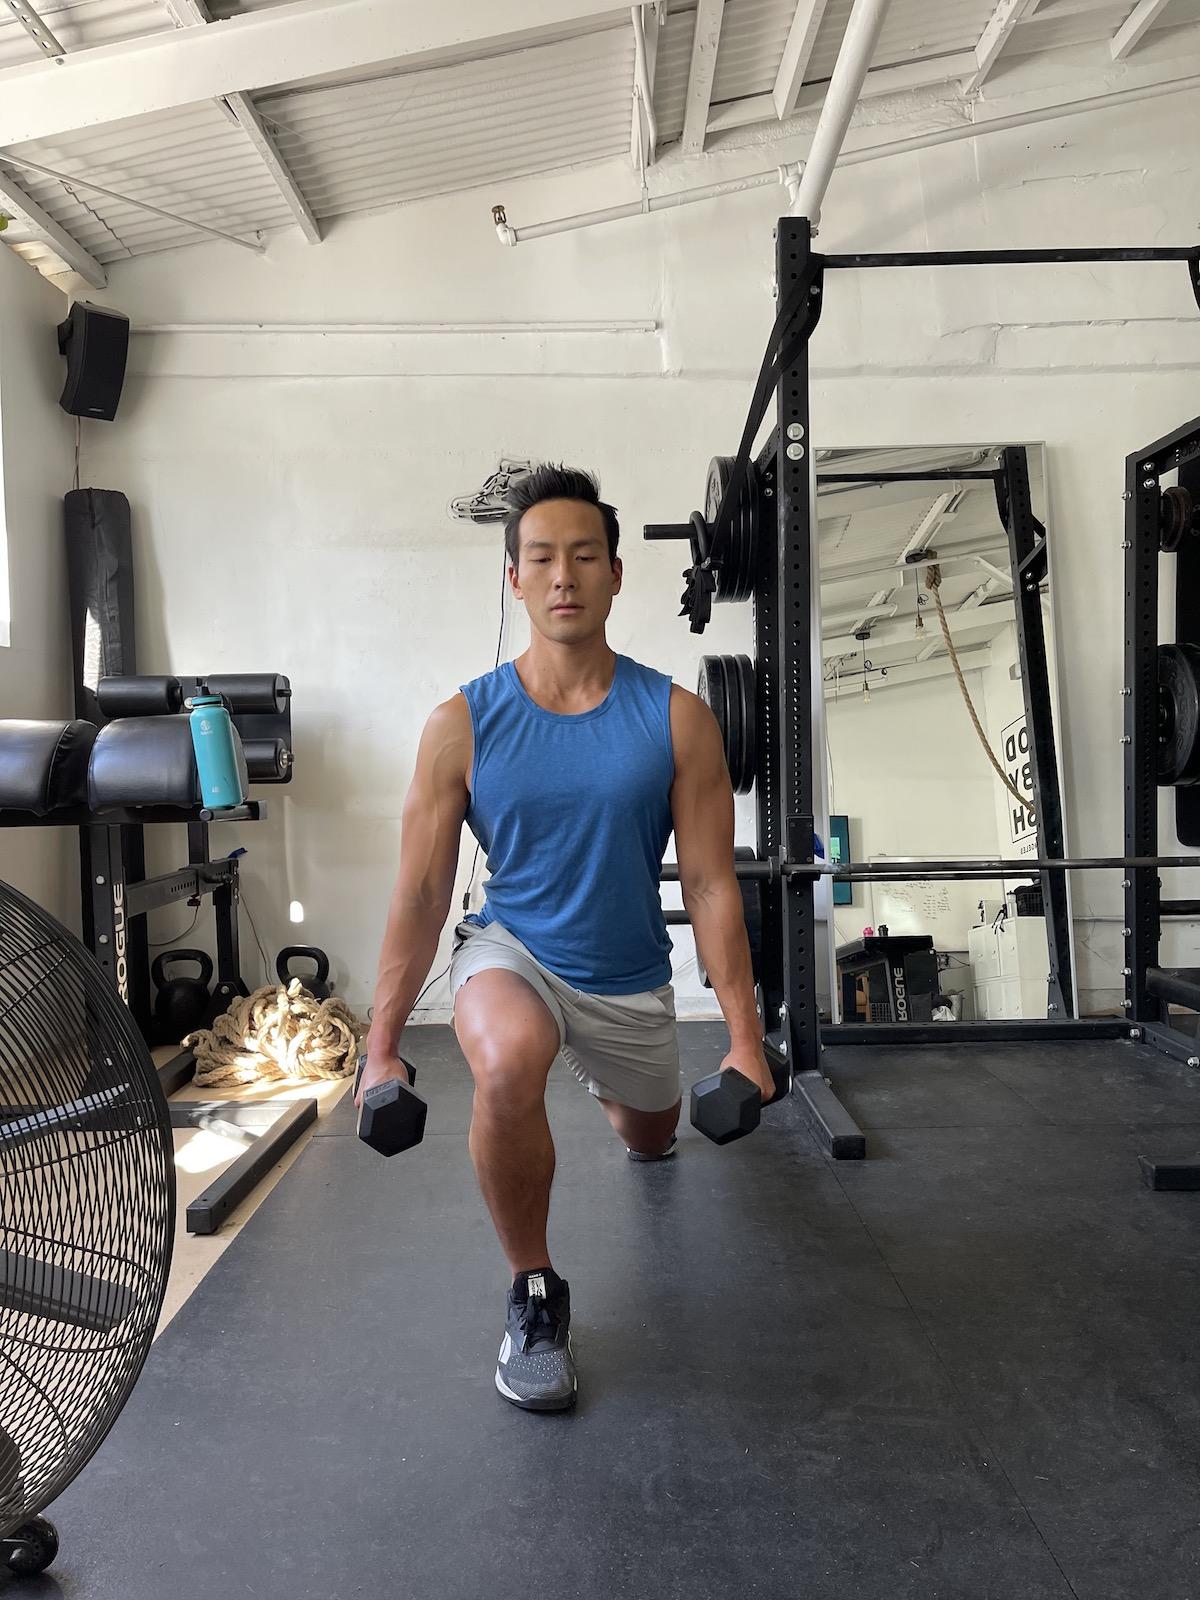 tim liu doing a dumbbell split squat